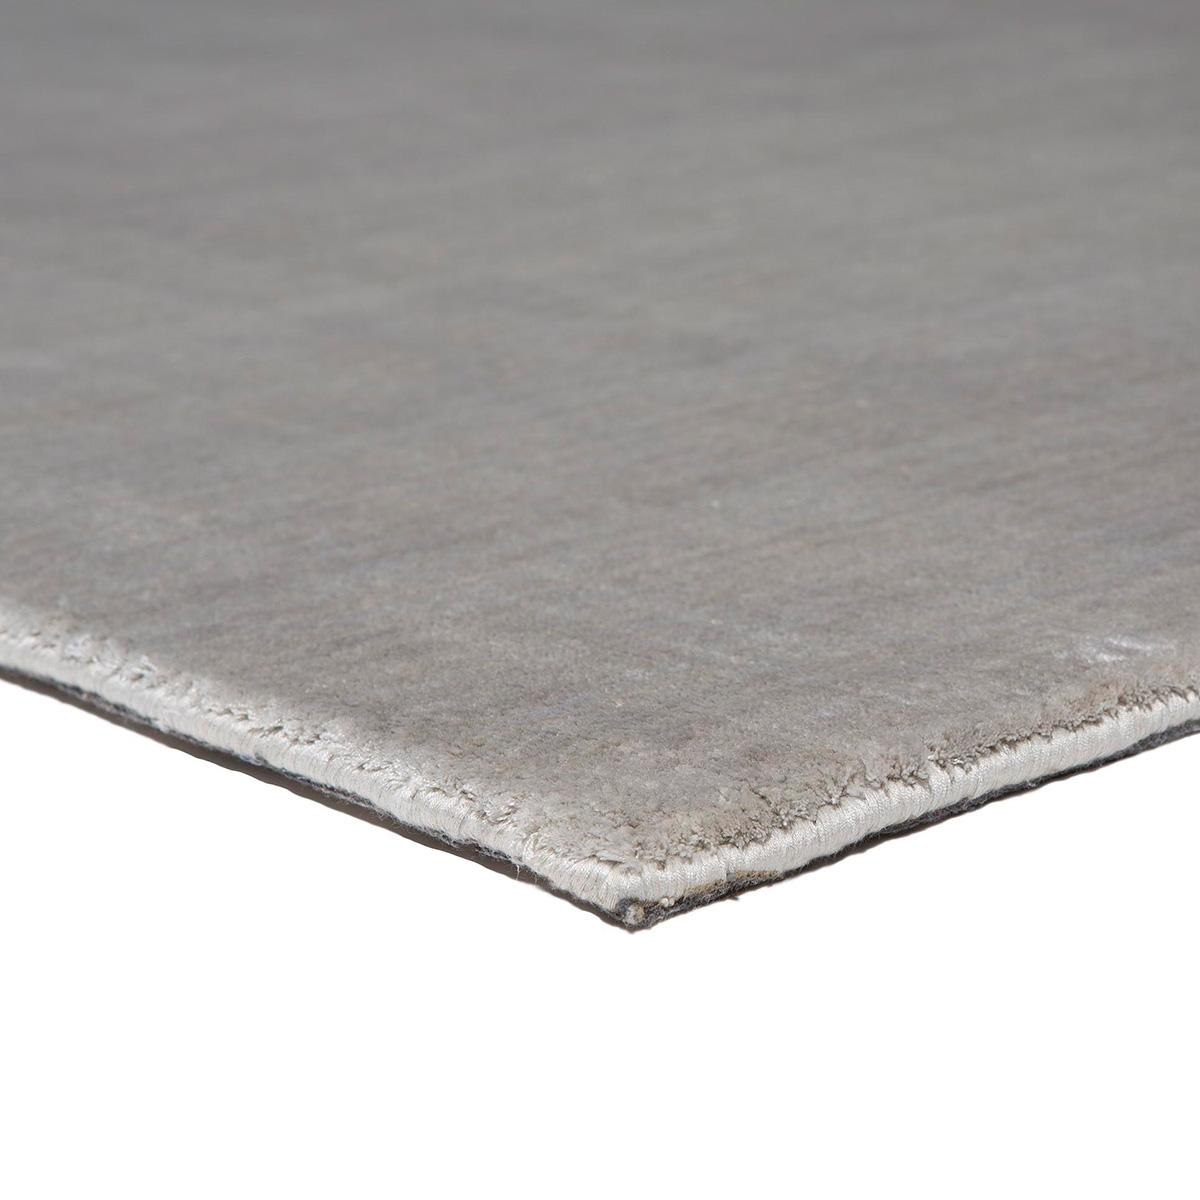 Vloerkleed Brinker Sensation Grey | 160 x 230 cm